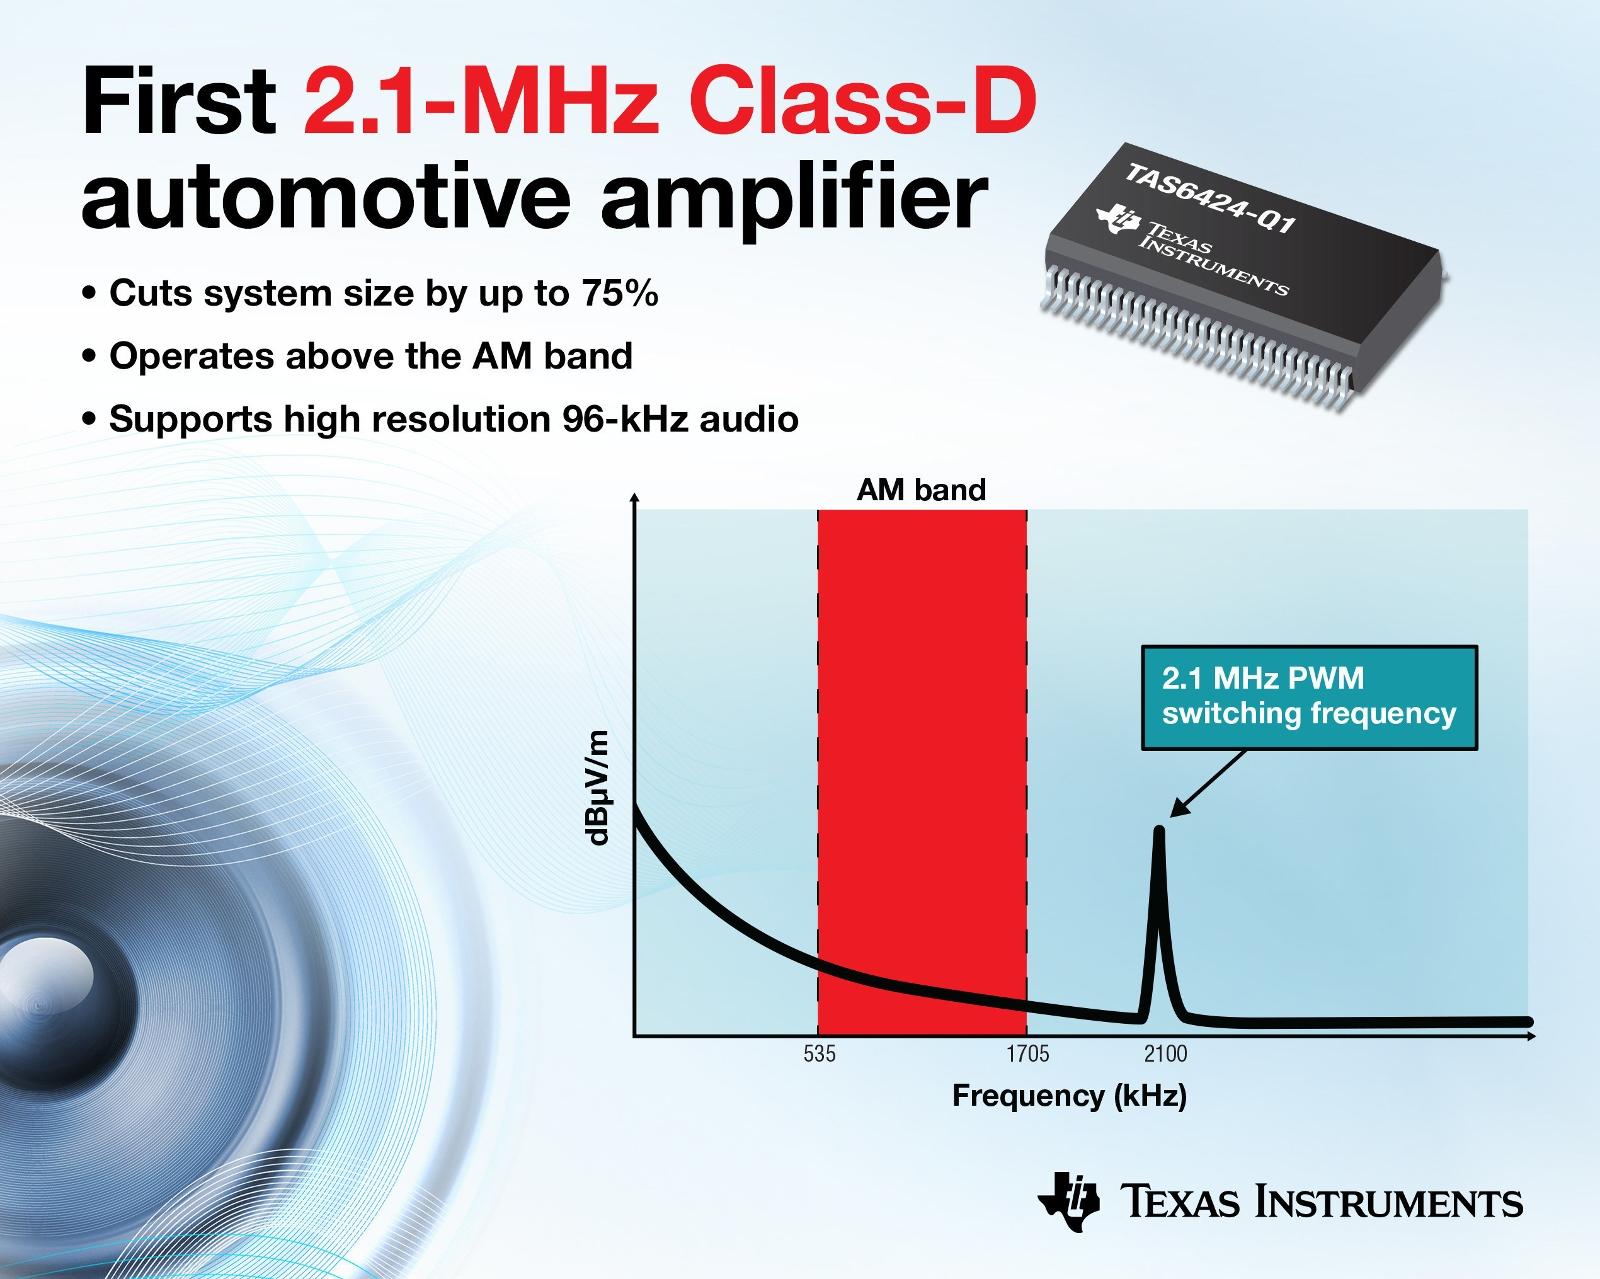 Texas Instruments Debuts Amplifier that will transform Automotive Audio Design